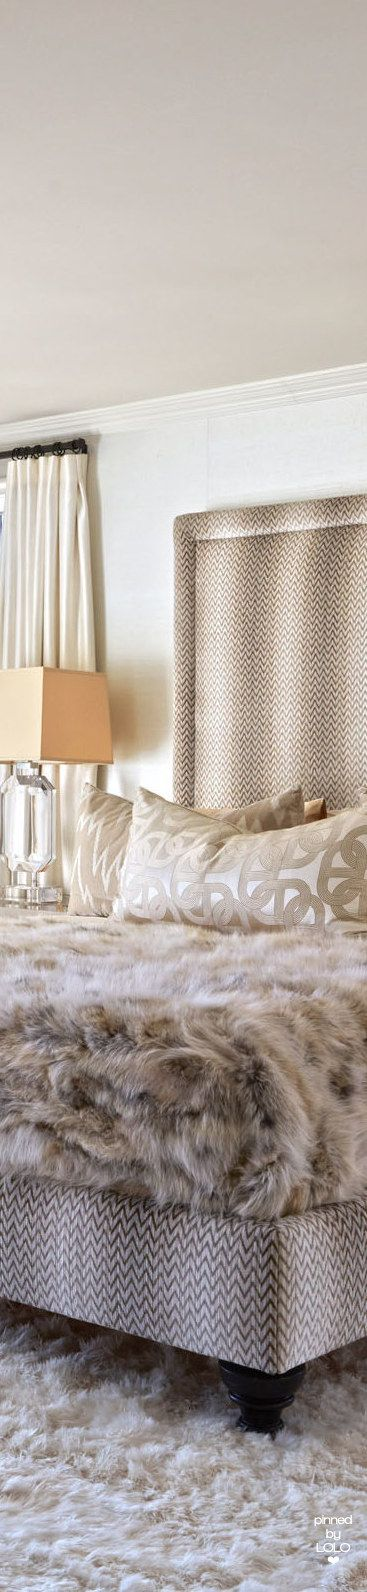 79 best MODERN BEDROOMS images on Pinterest Modern bedroom Modern